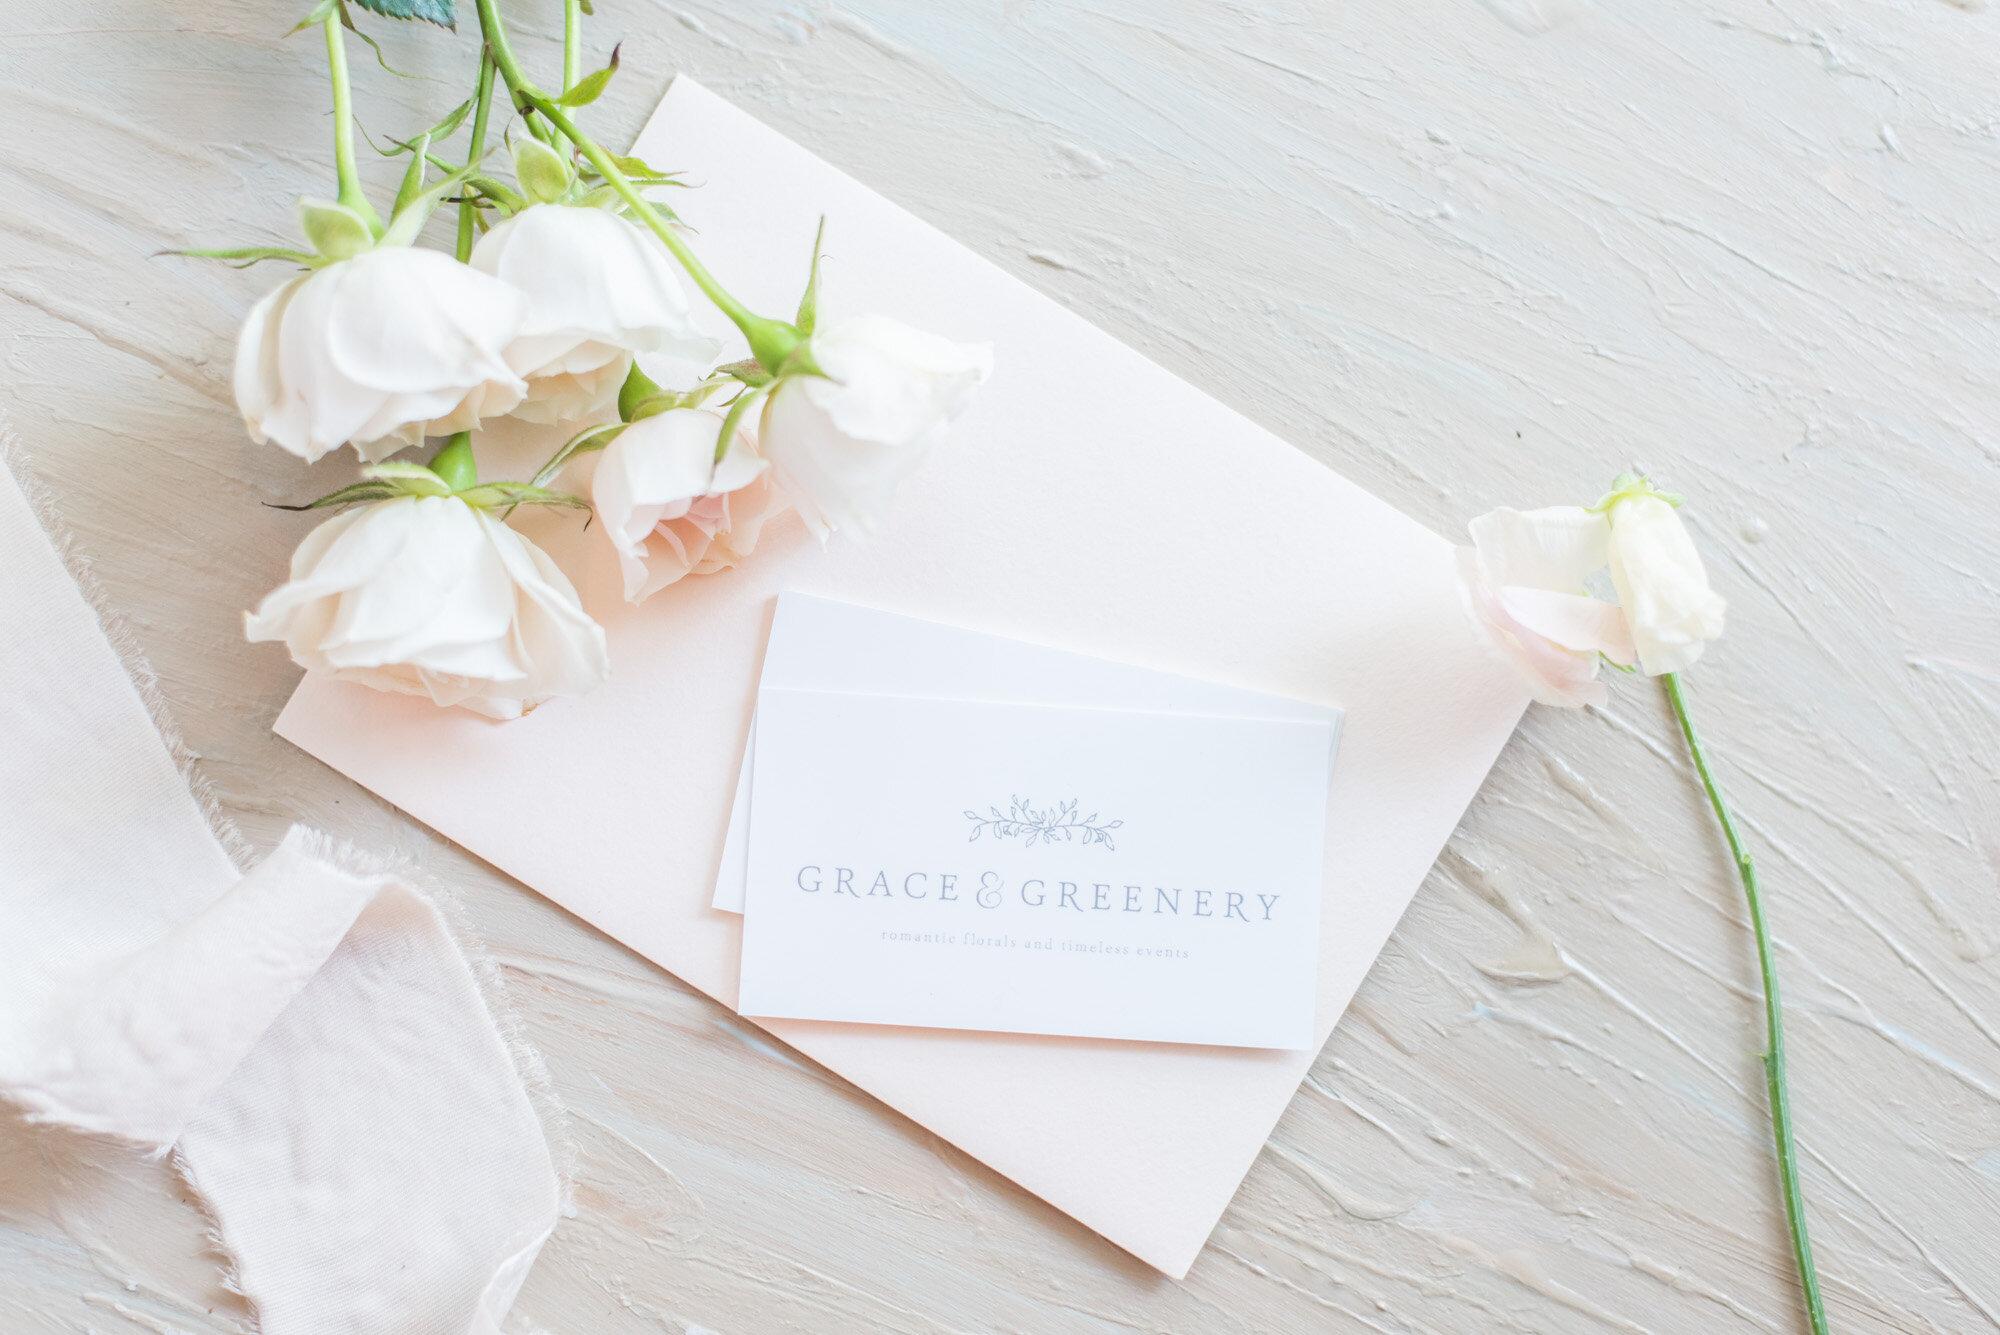 Madalyn Yates Photography Business Card Flat Lay